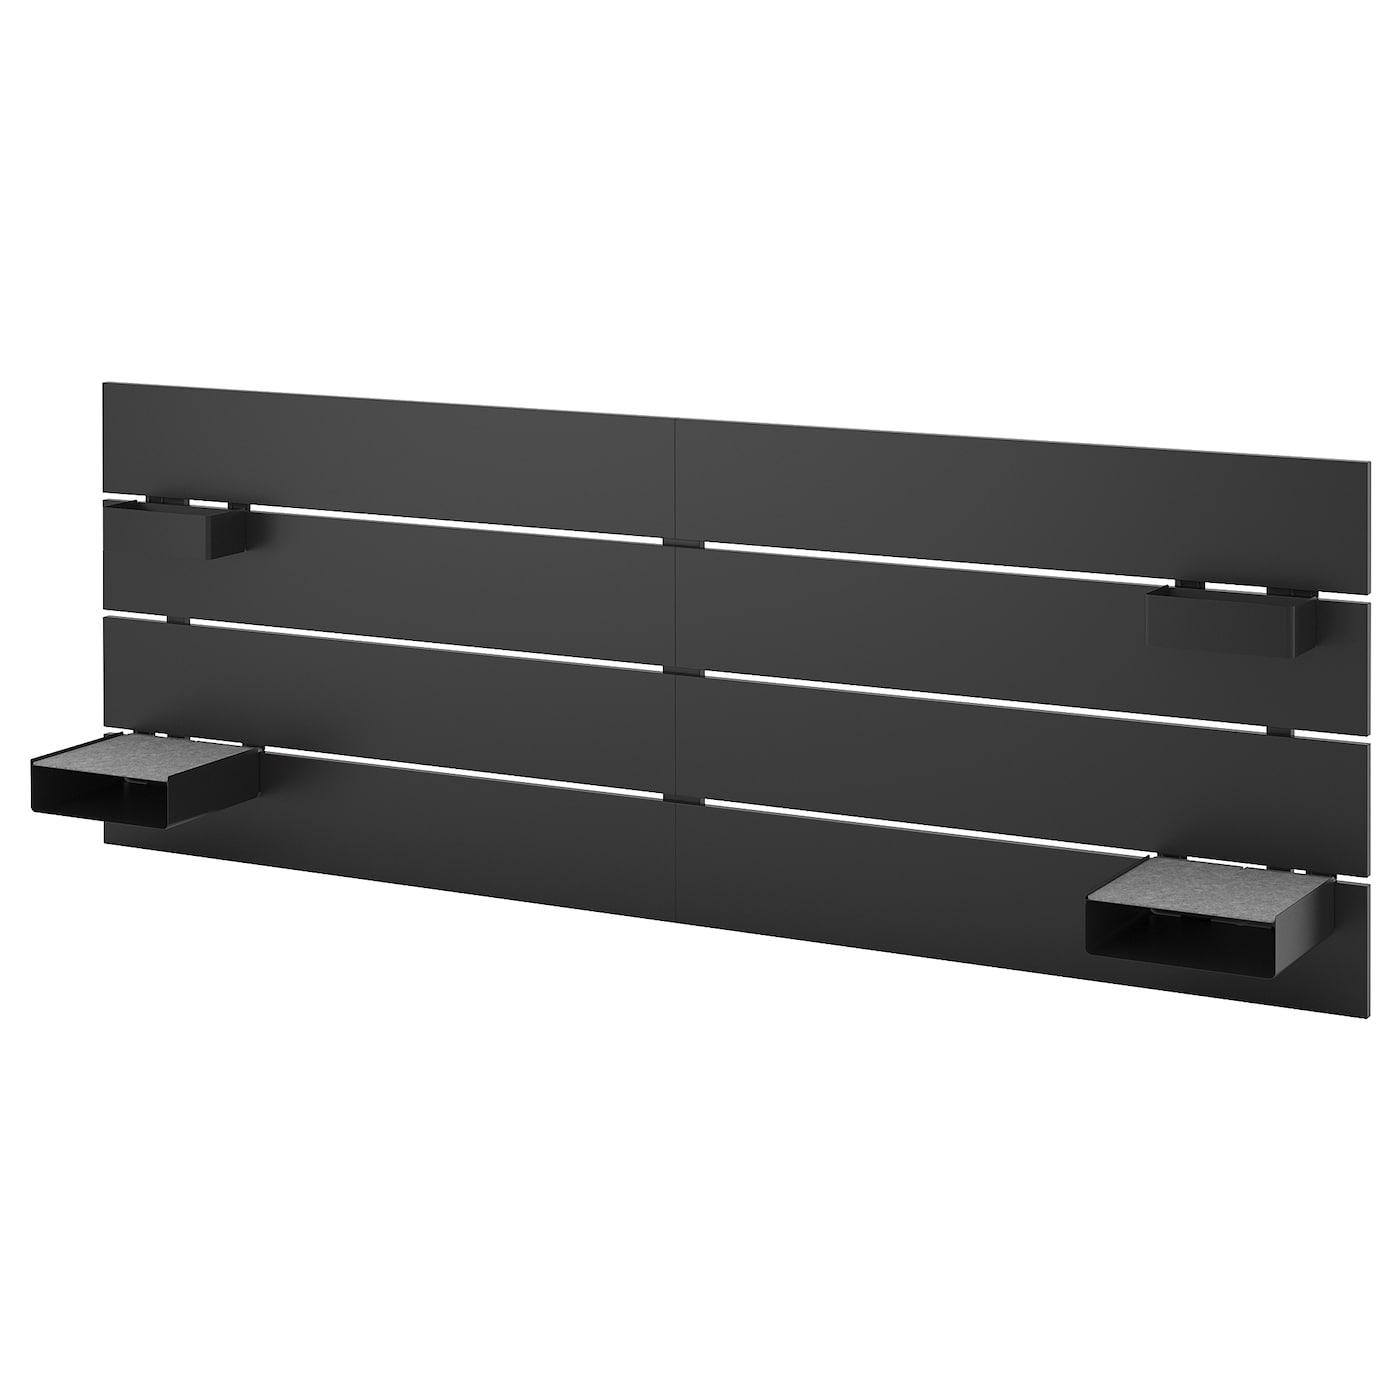 Nordli Headboard Anthracite 140 160 Cm Ikea